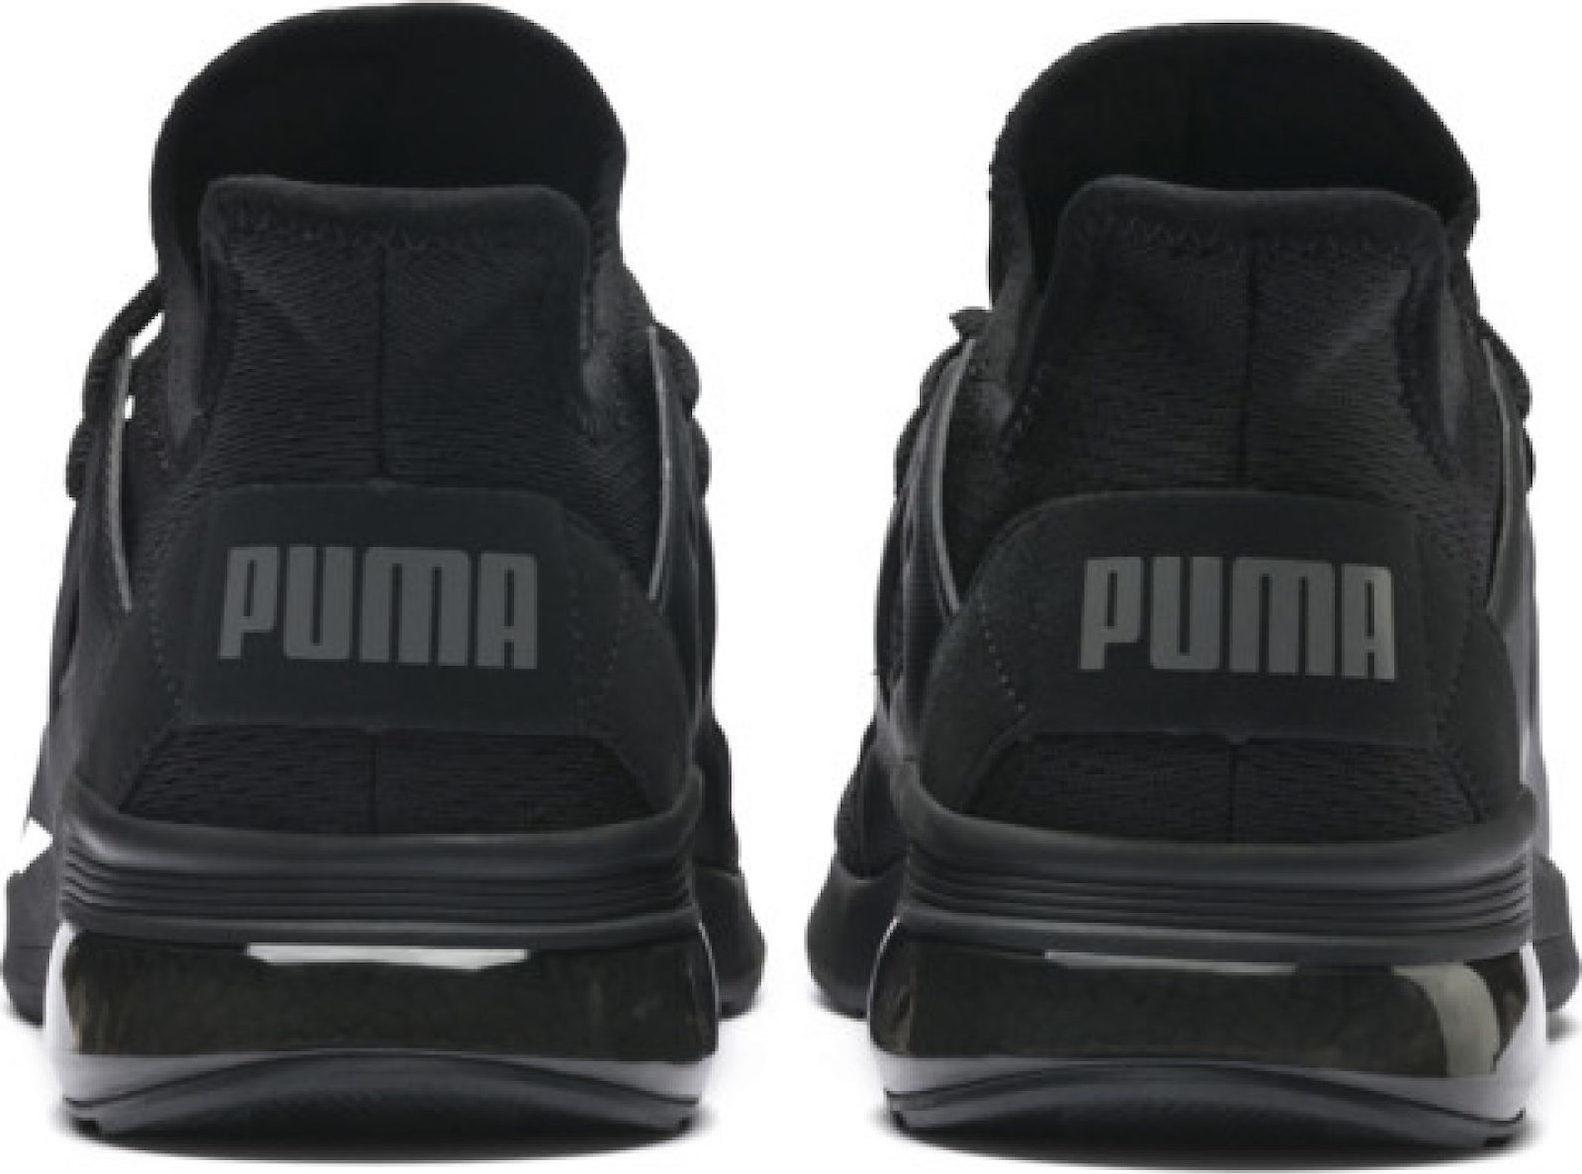 58b96bda579 Puma Electron Street Eng Mesh 369124-01 - Skroutz.gr